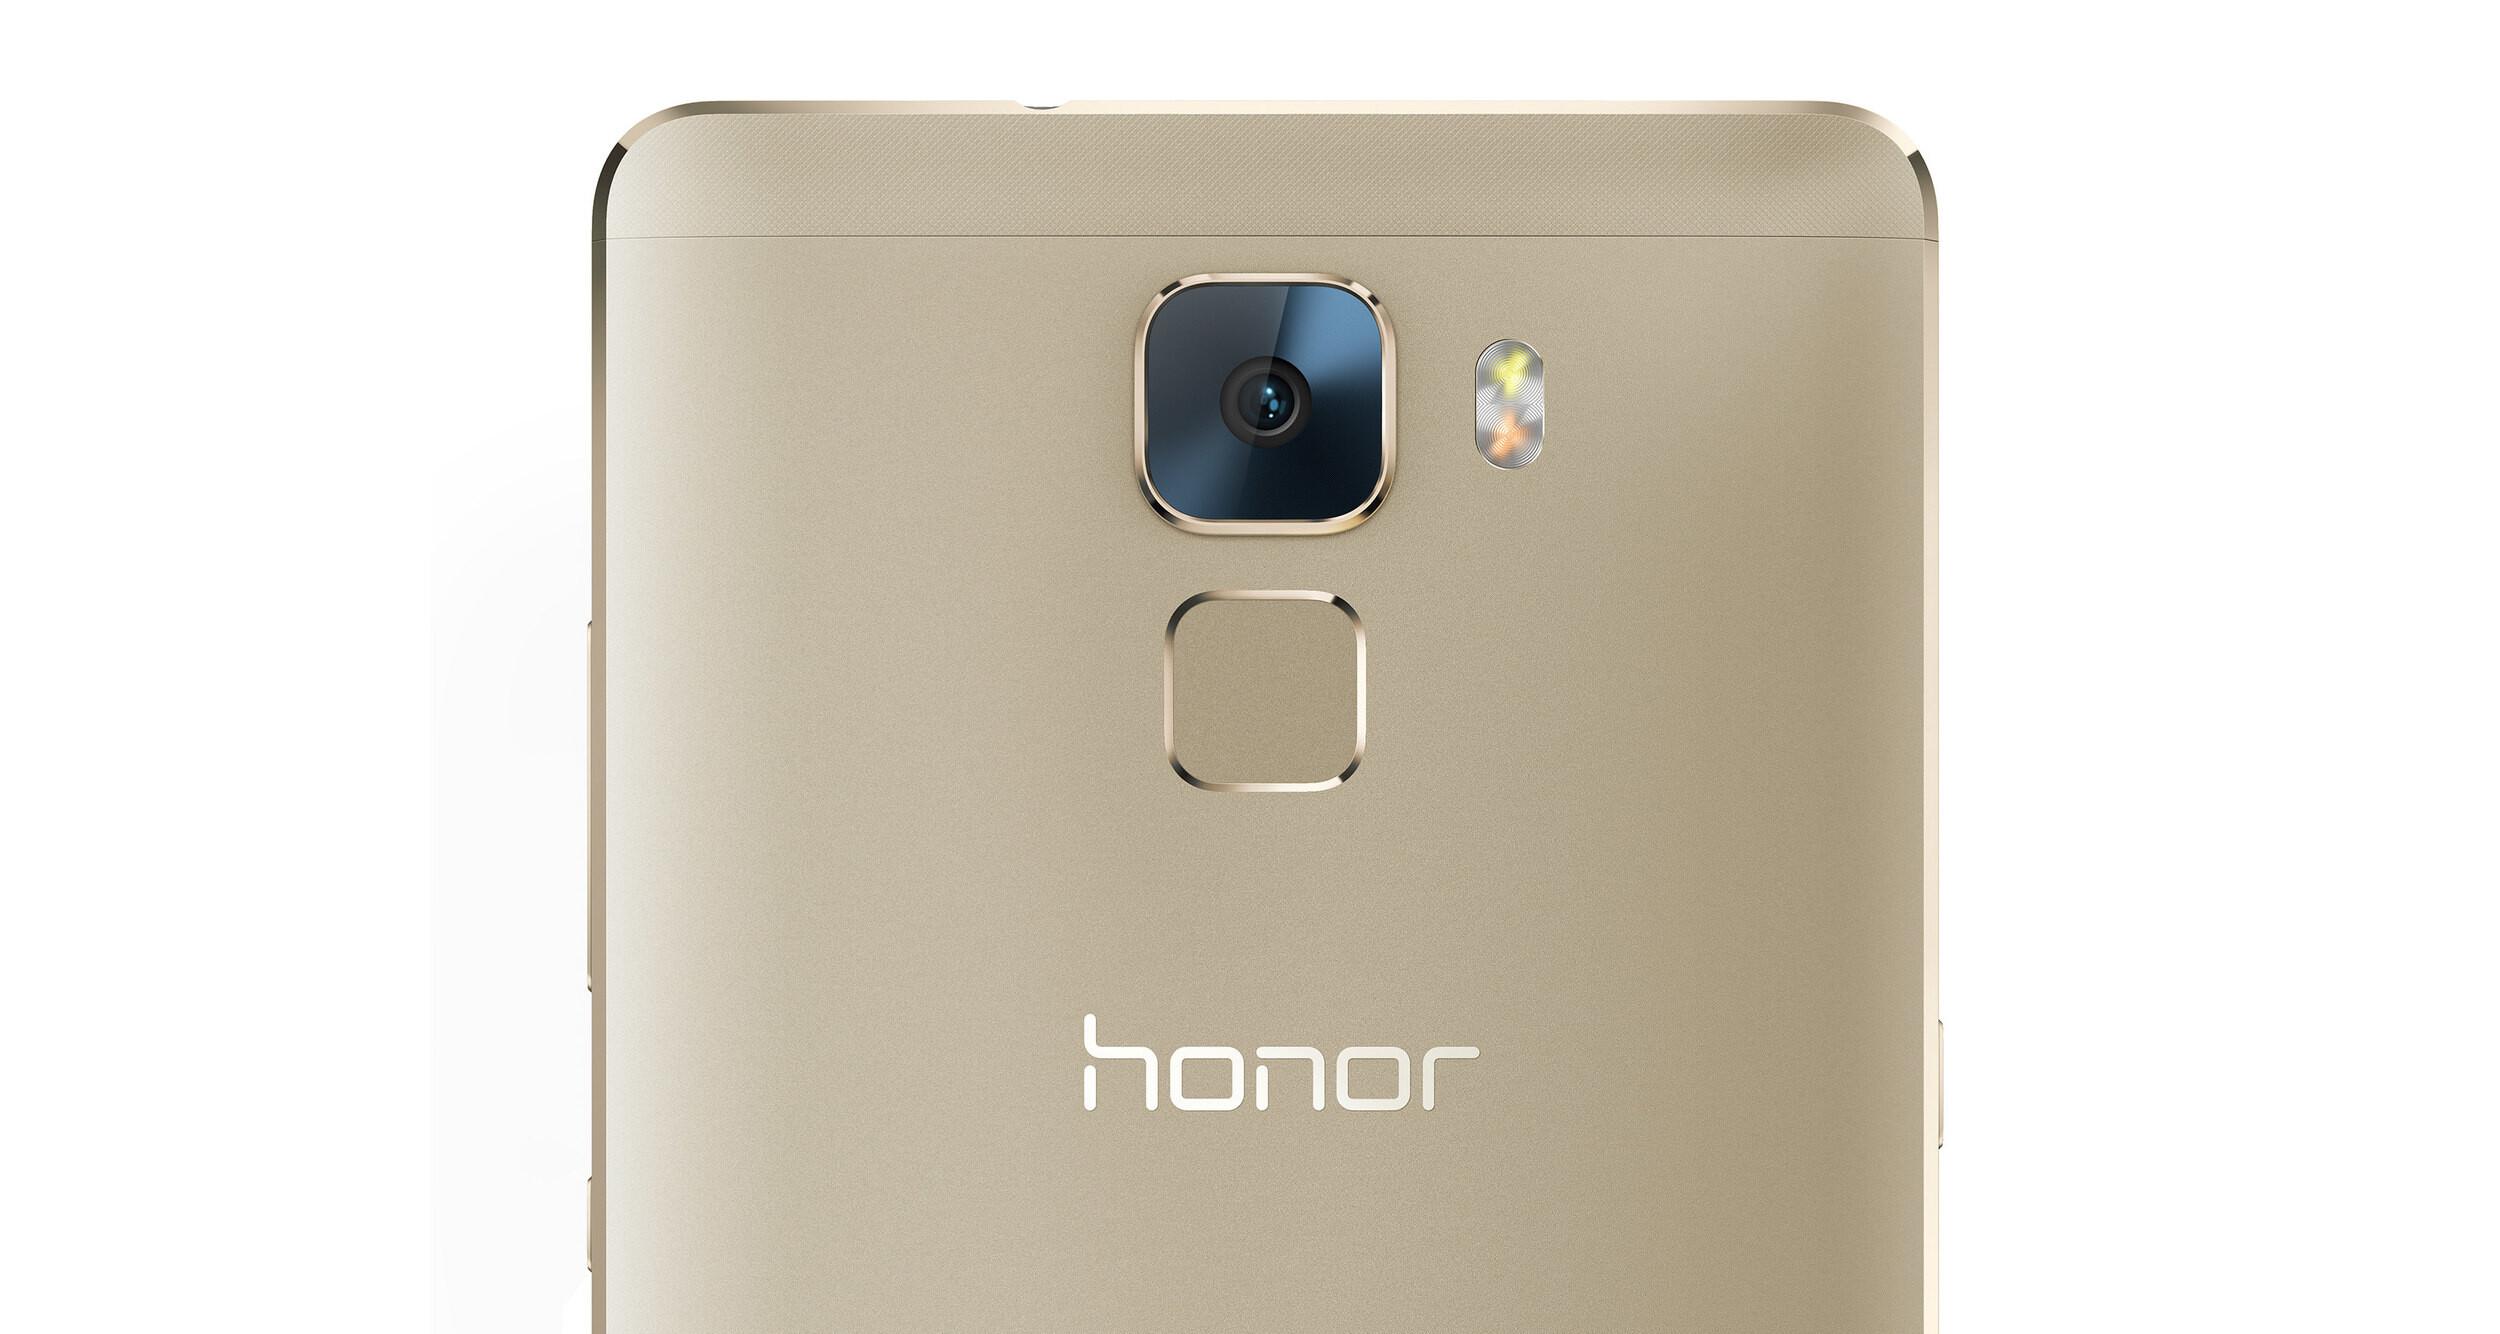 huawei honor 7 data uscita recensione caratteristiche